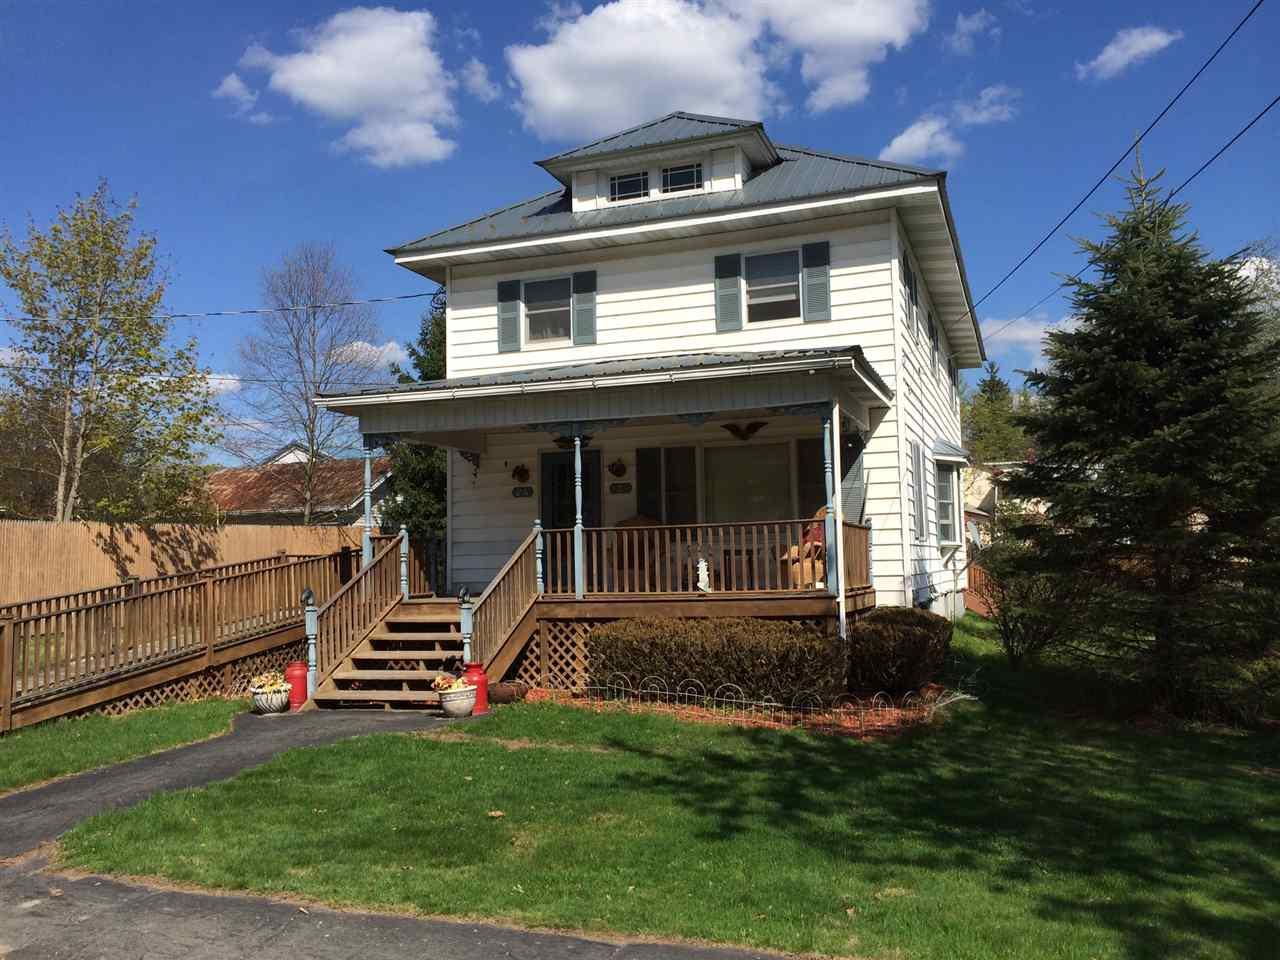 Real Estate for Sale, ListingId: 31768391, Jeffersonville,NY12748